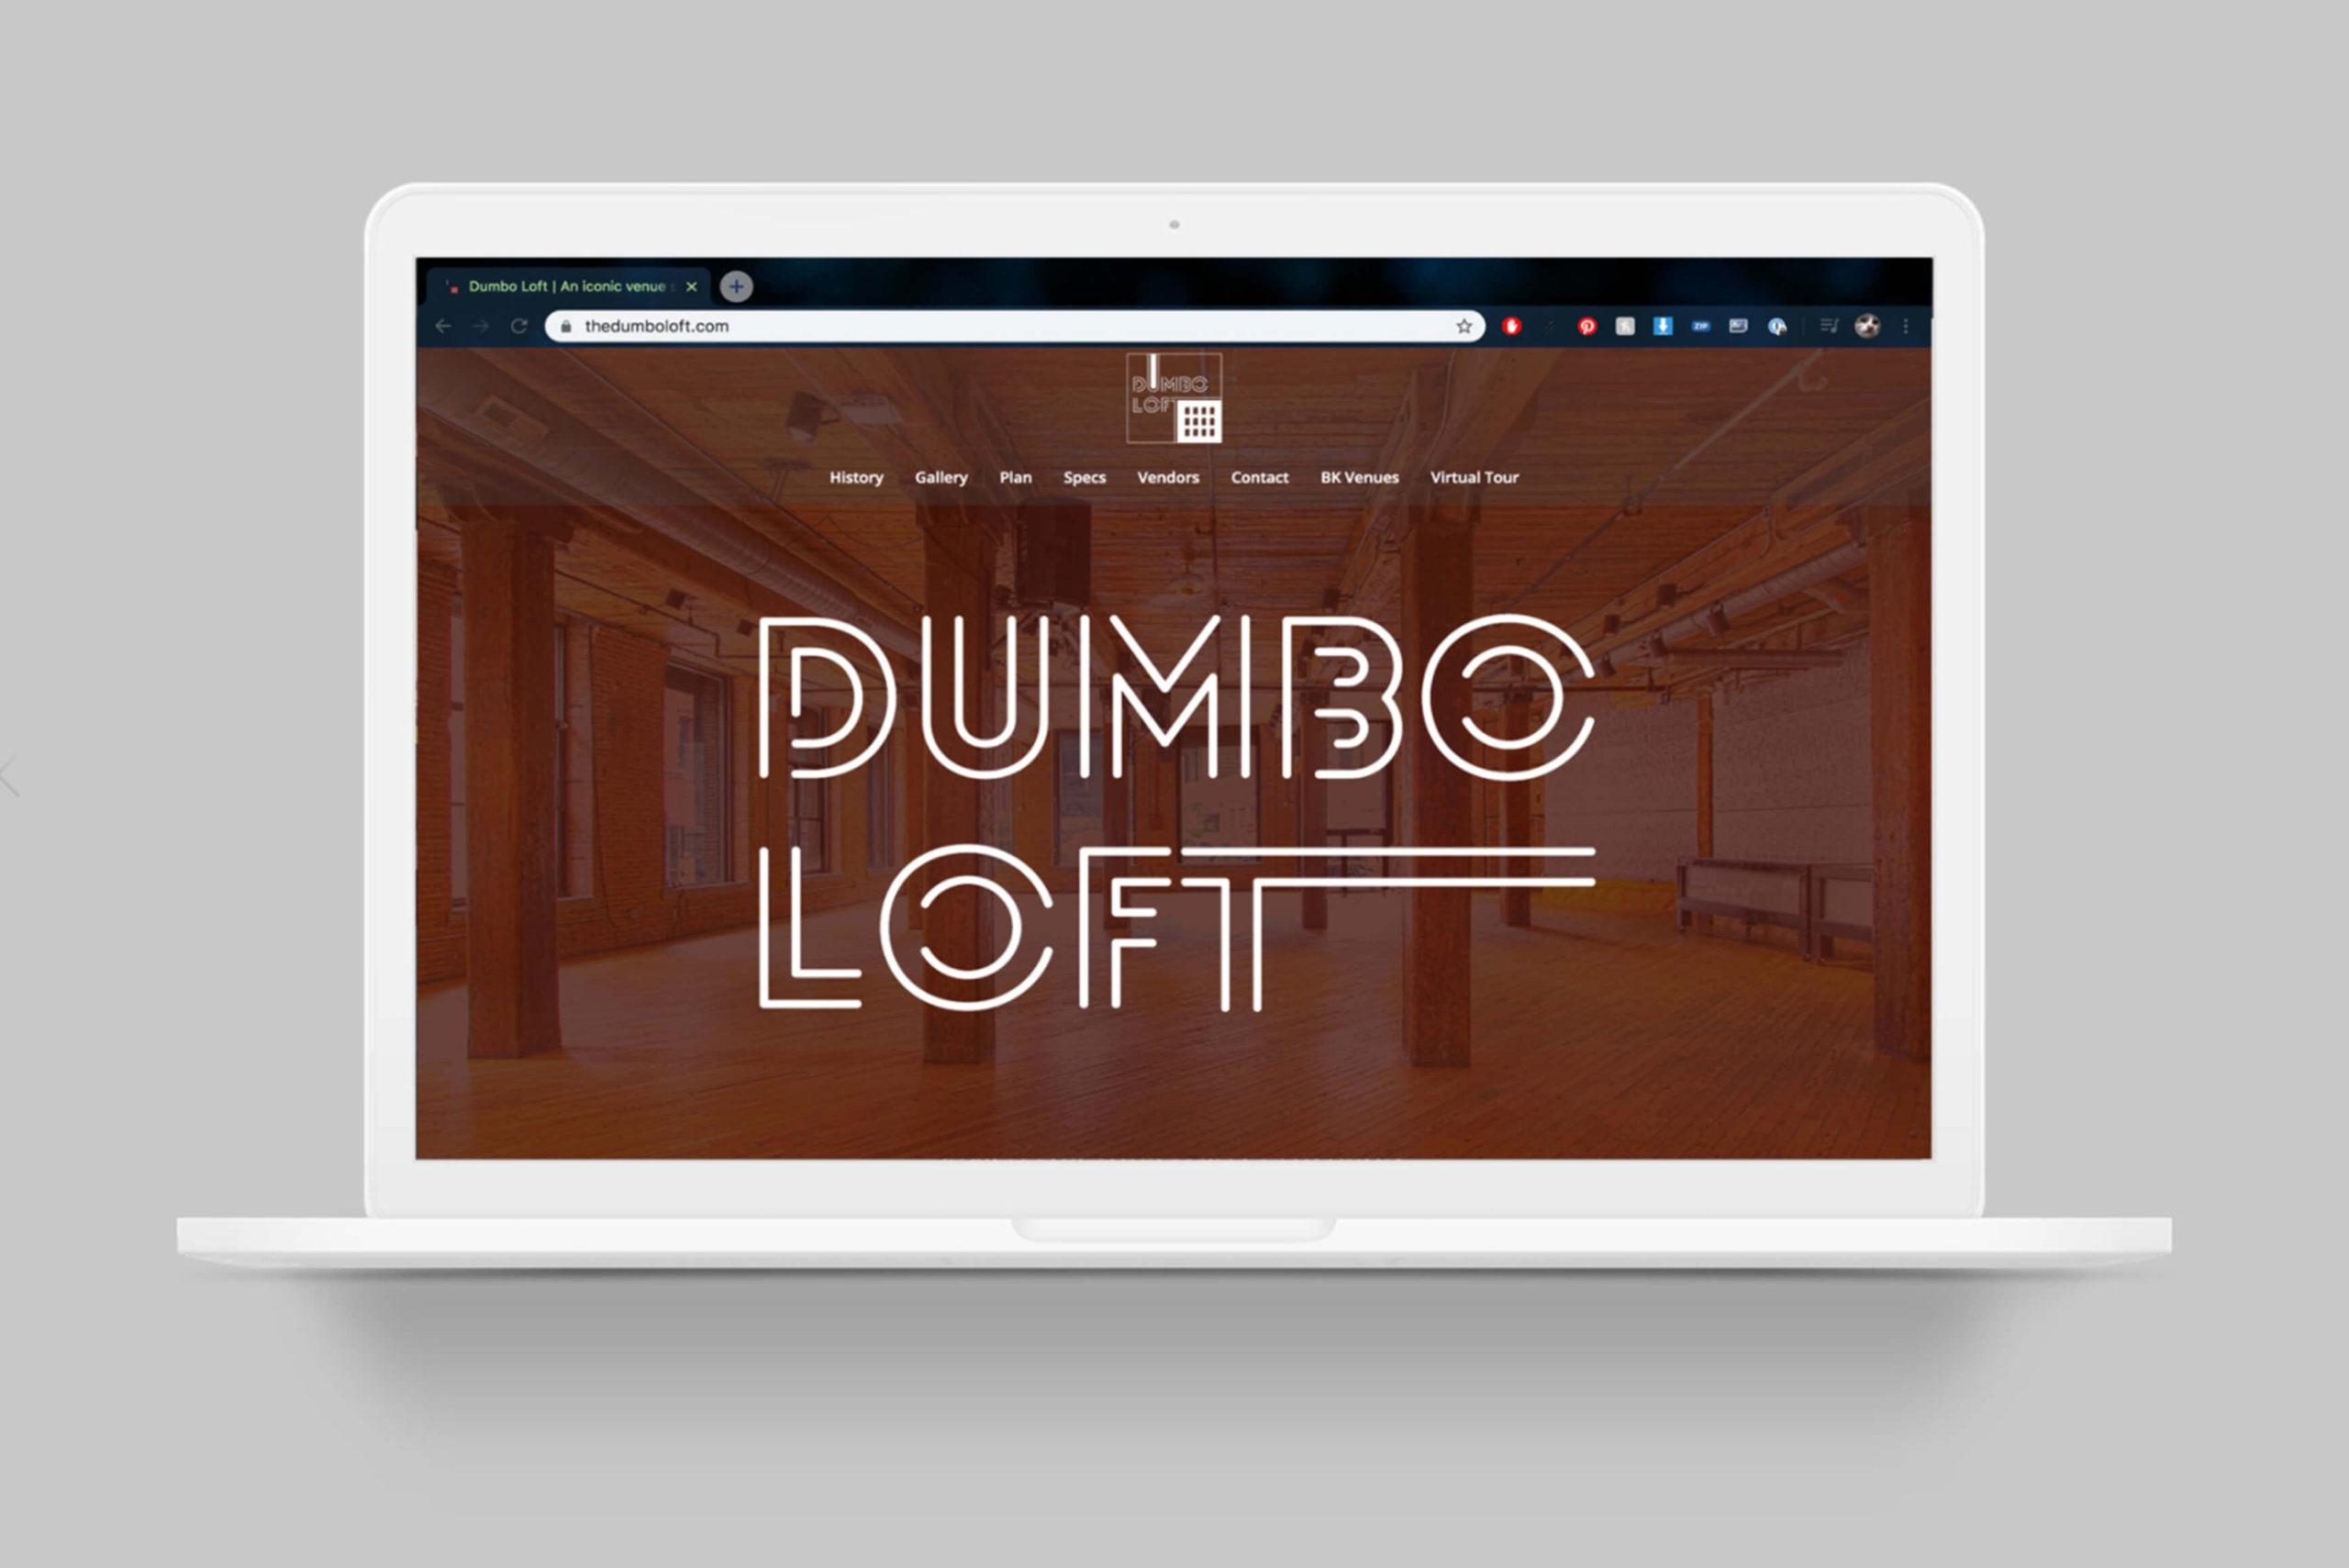 TheDumboLoft.com